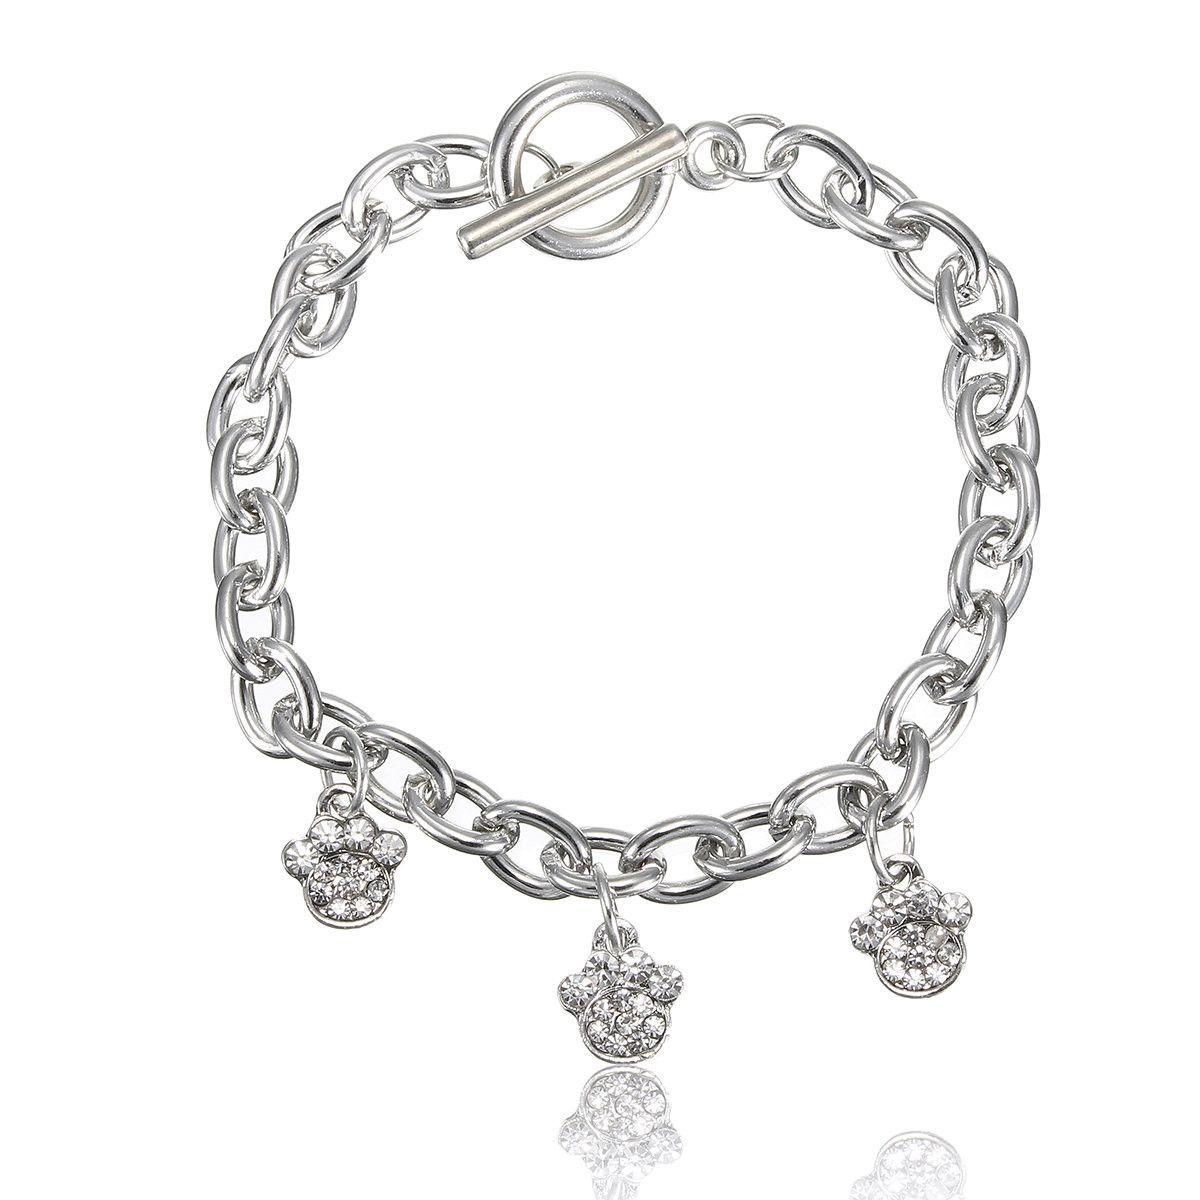 Three Animal Paws Rhinestone Pendant Bracelet